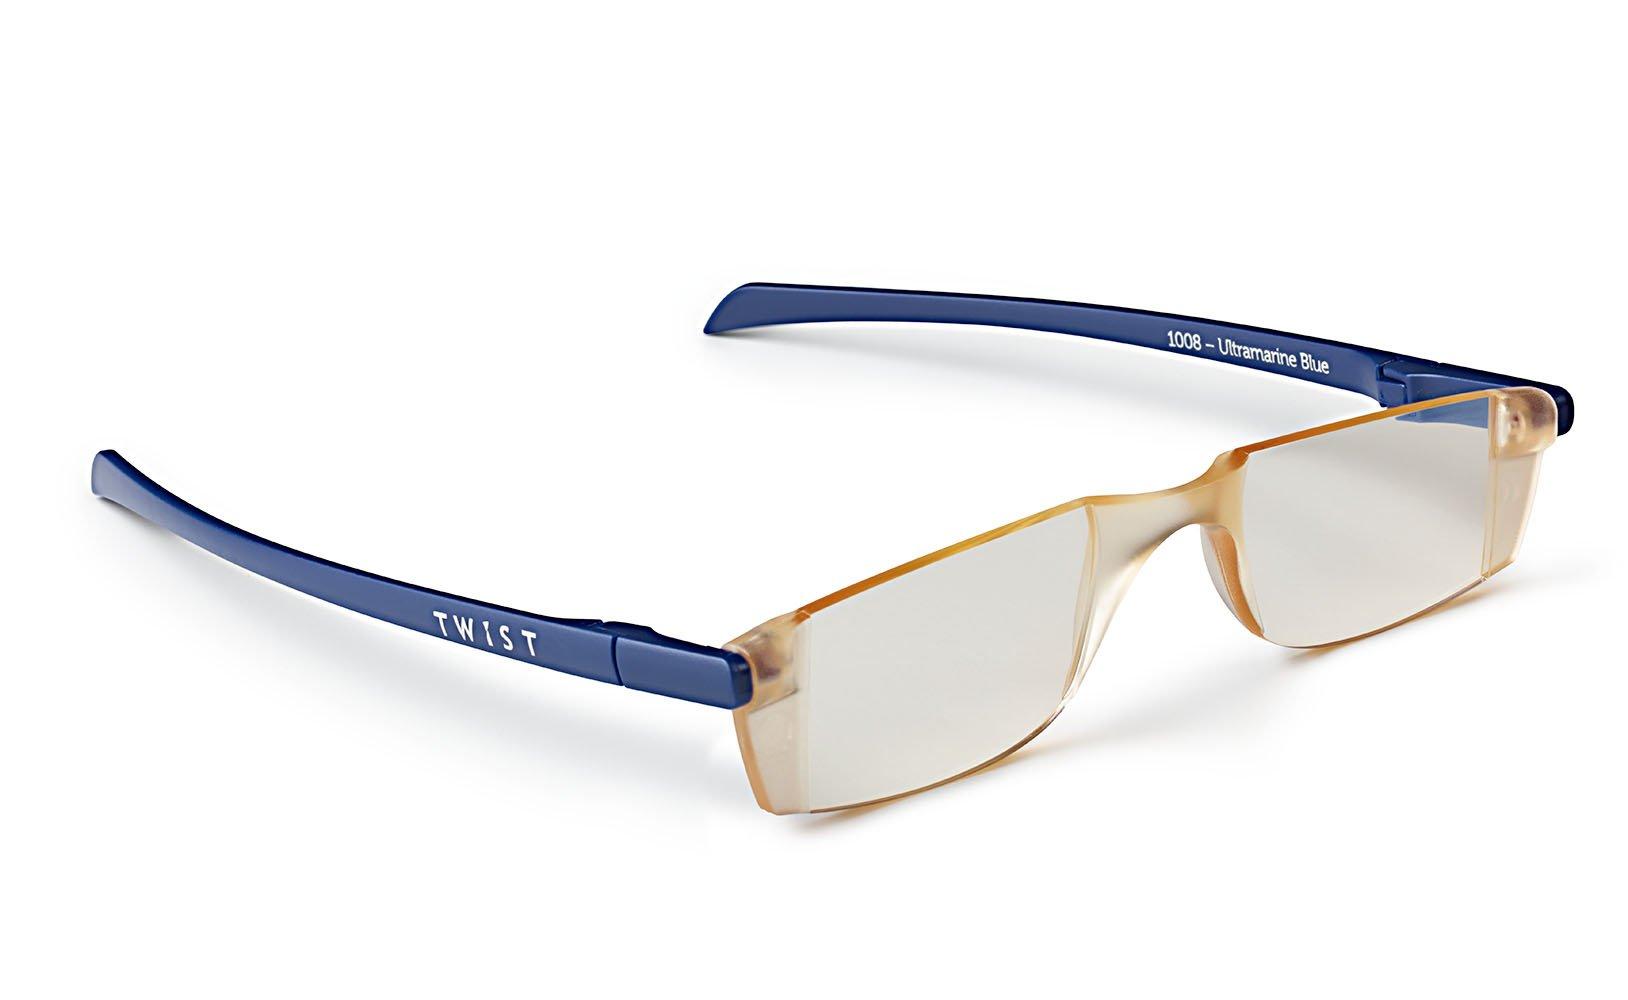 TWIST ONE type: Flat Folding Computer Reading Glasses (+2.0, Ultramarine Blue)